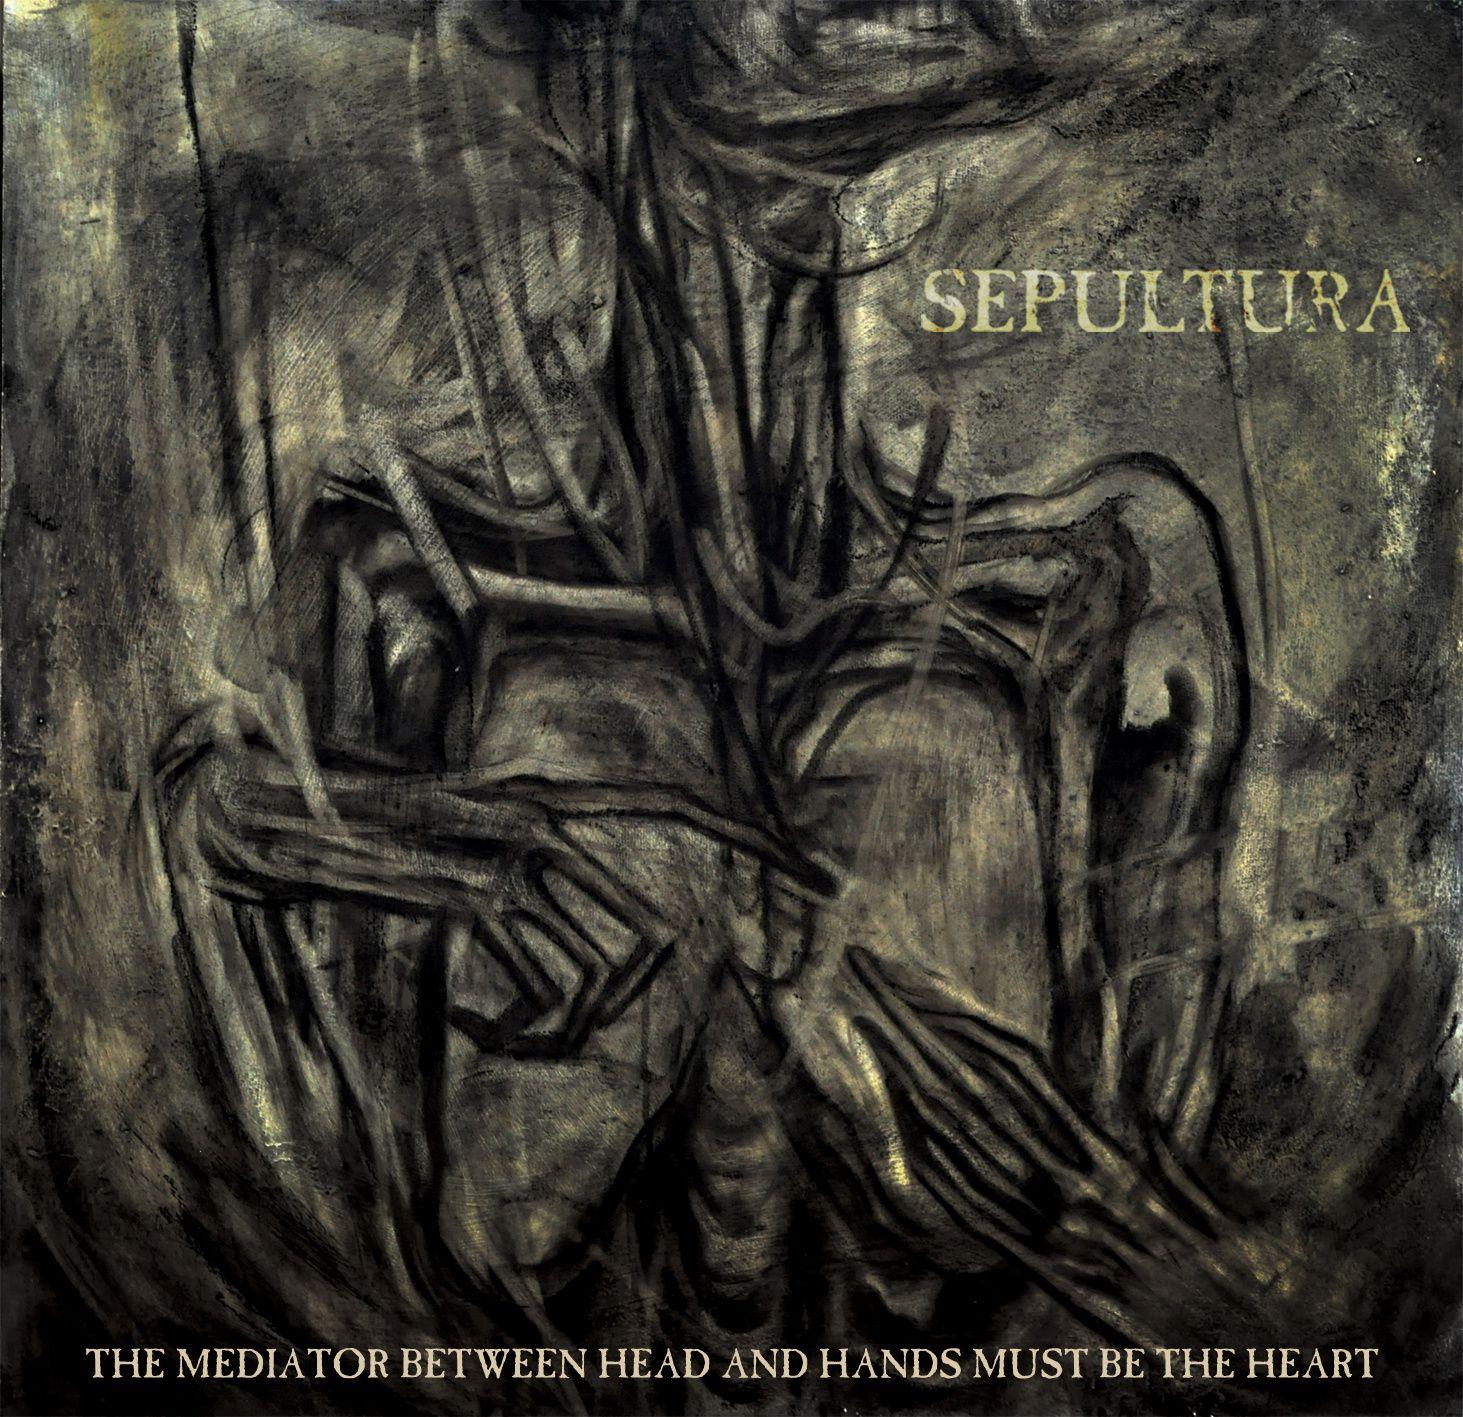 SEPULTURA reveals tracklist and cover of the new album